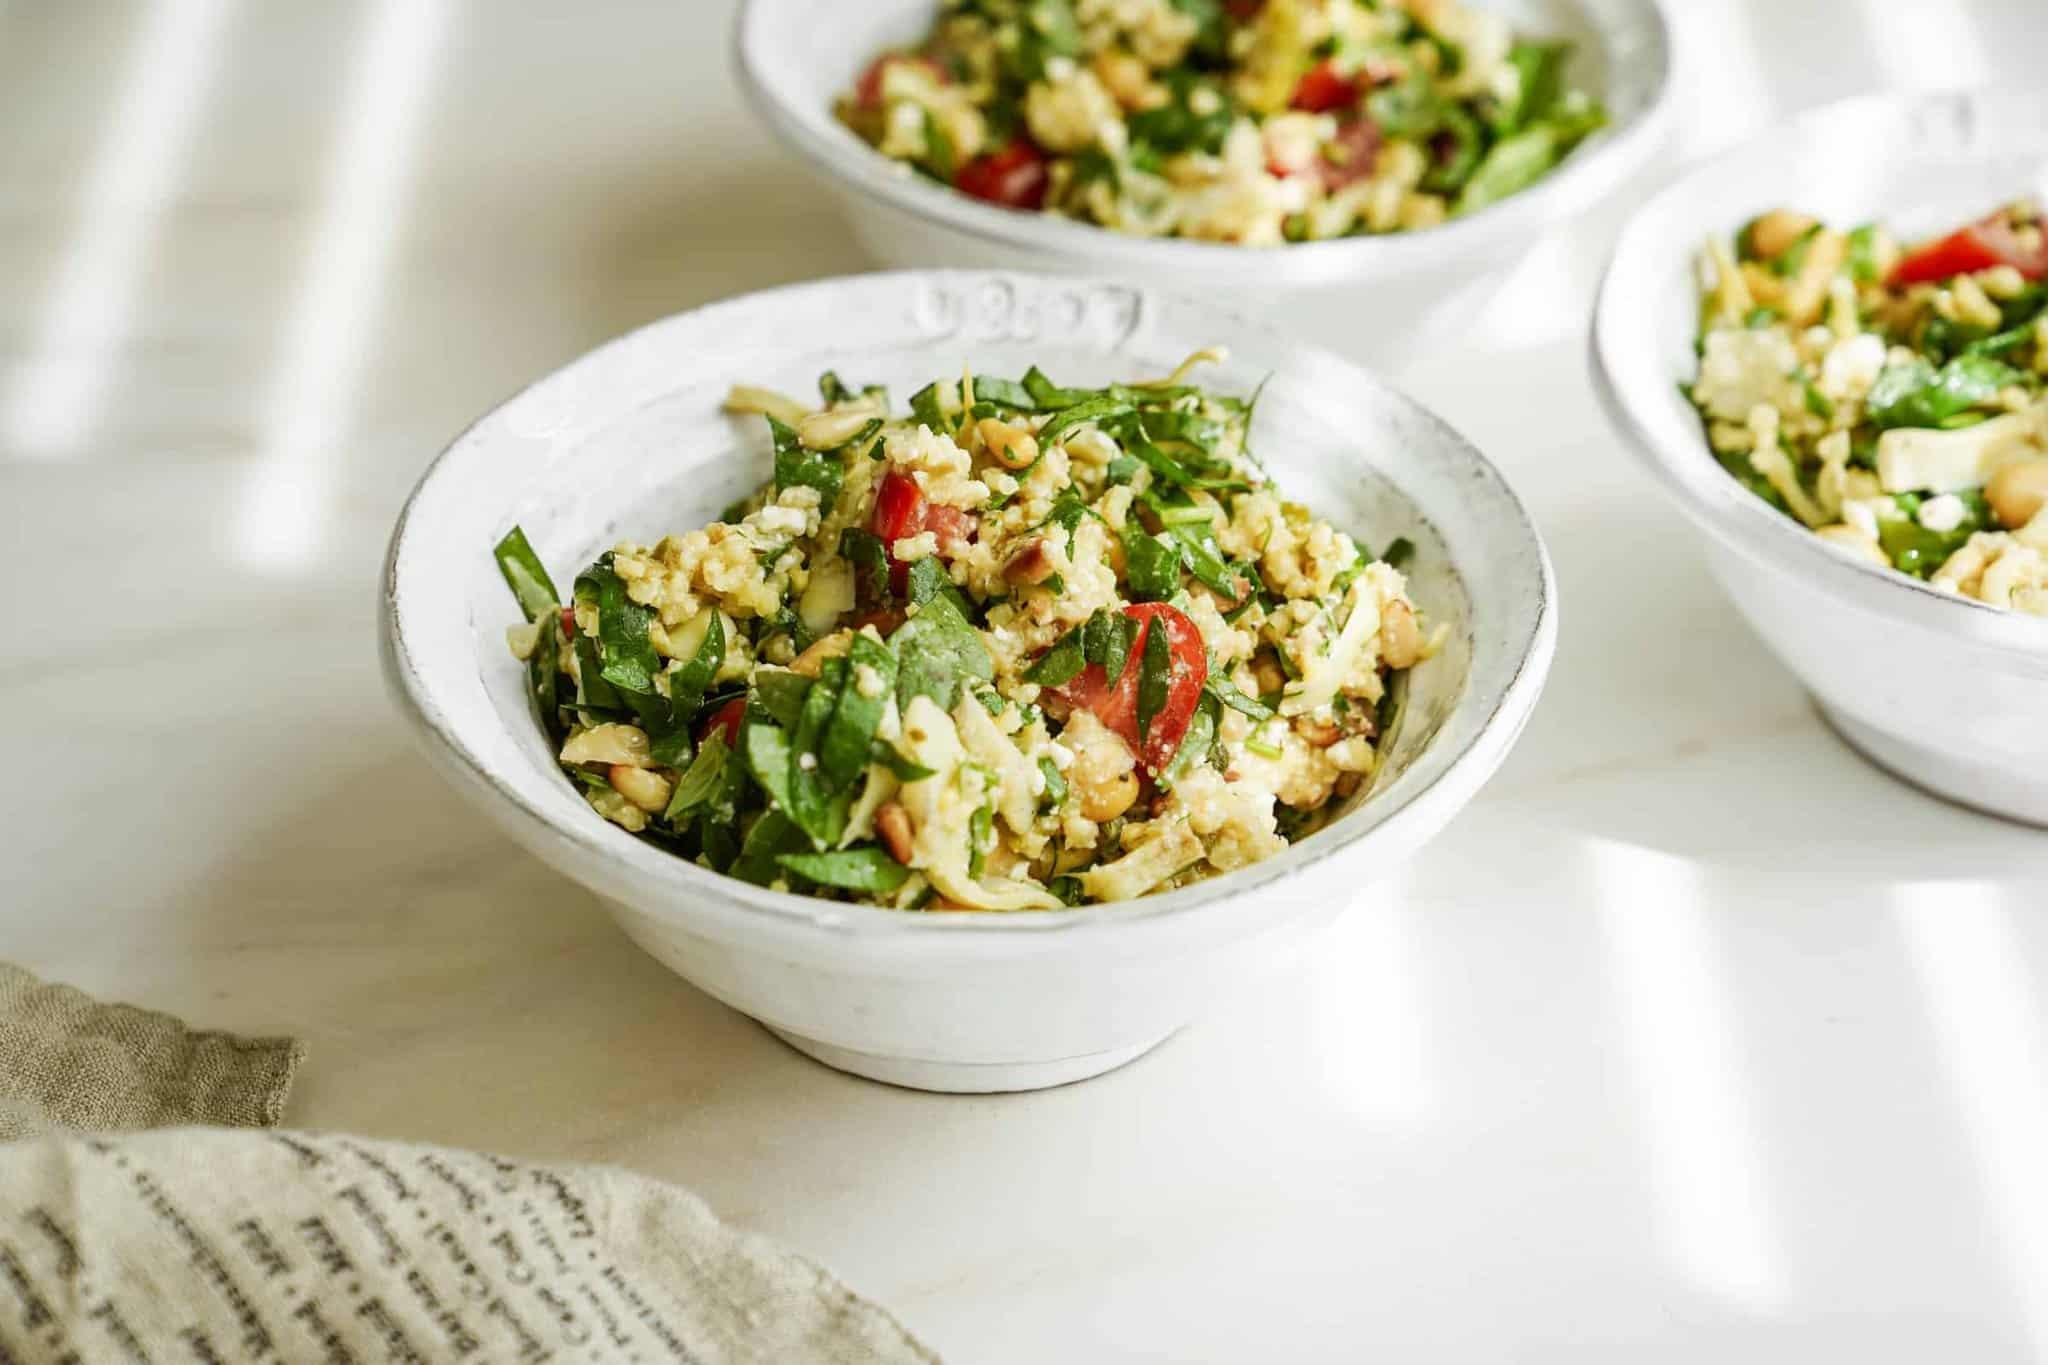 Mediterranean Salad Recipe in a large white bowl